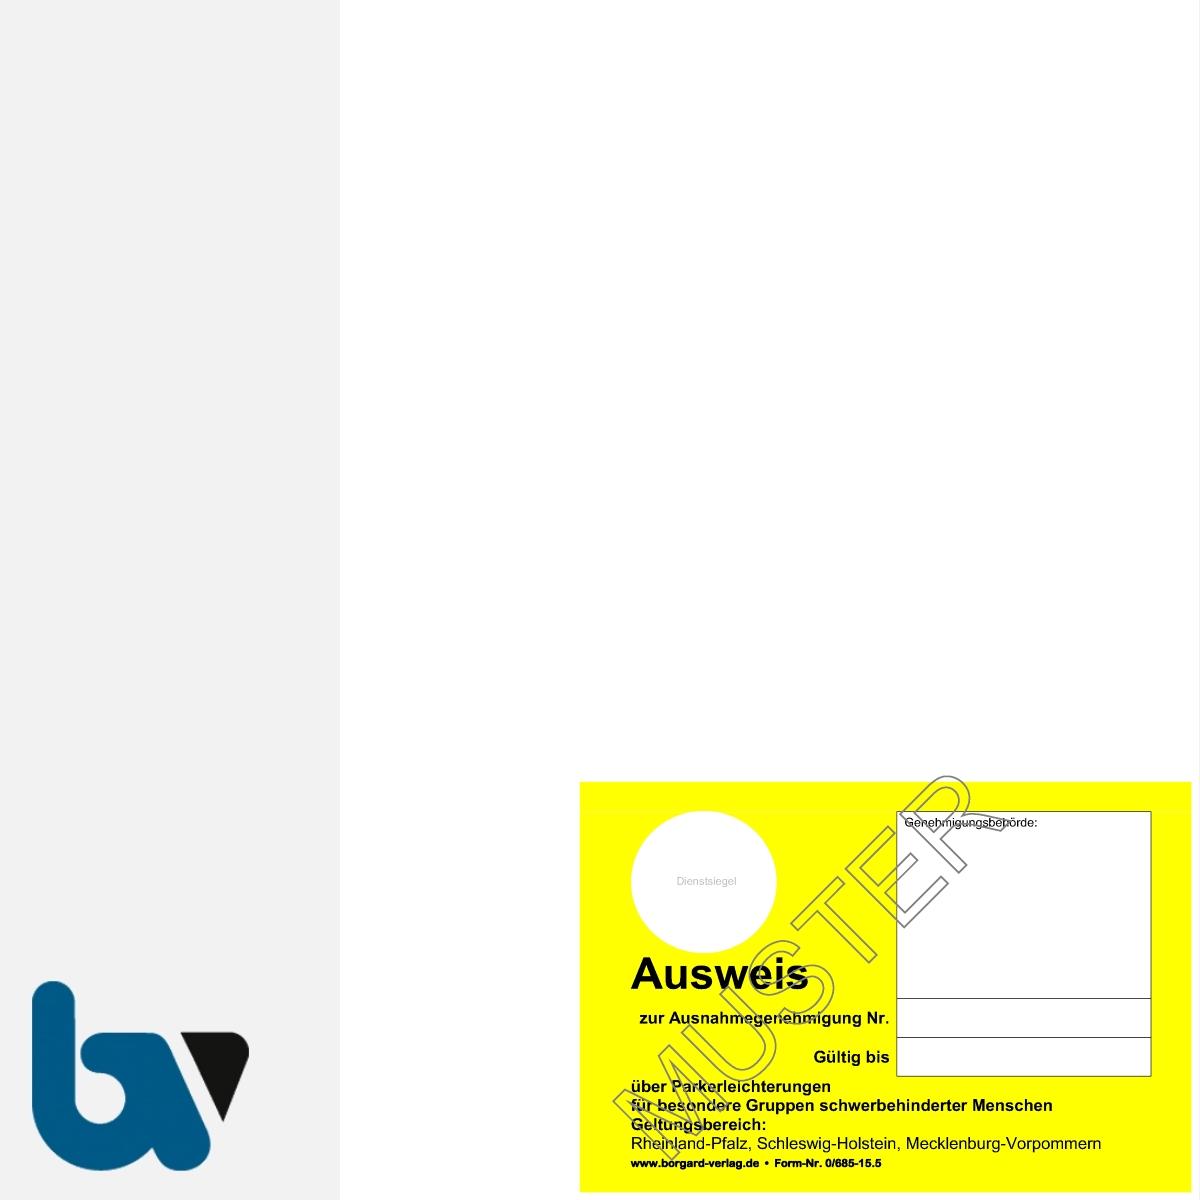 0/685-15.5 Parkausweis zur Ausnahmegenehmigung Parkerleichterungen Sonderregelung RP SH MV gelb Modell behinderte Menschen DIN A4 perforiert VS   Borgard Verlag GmbH